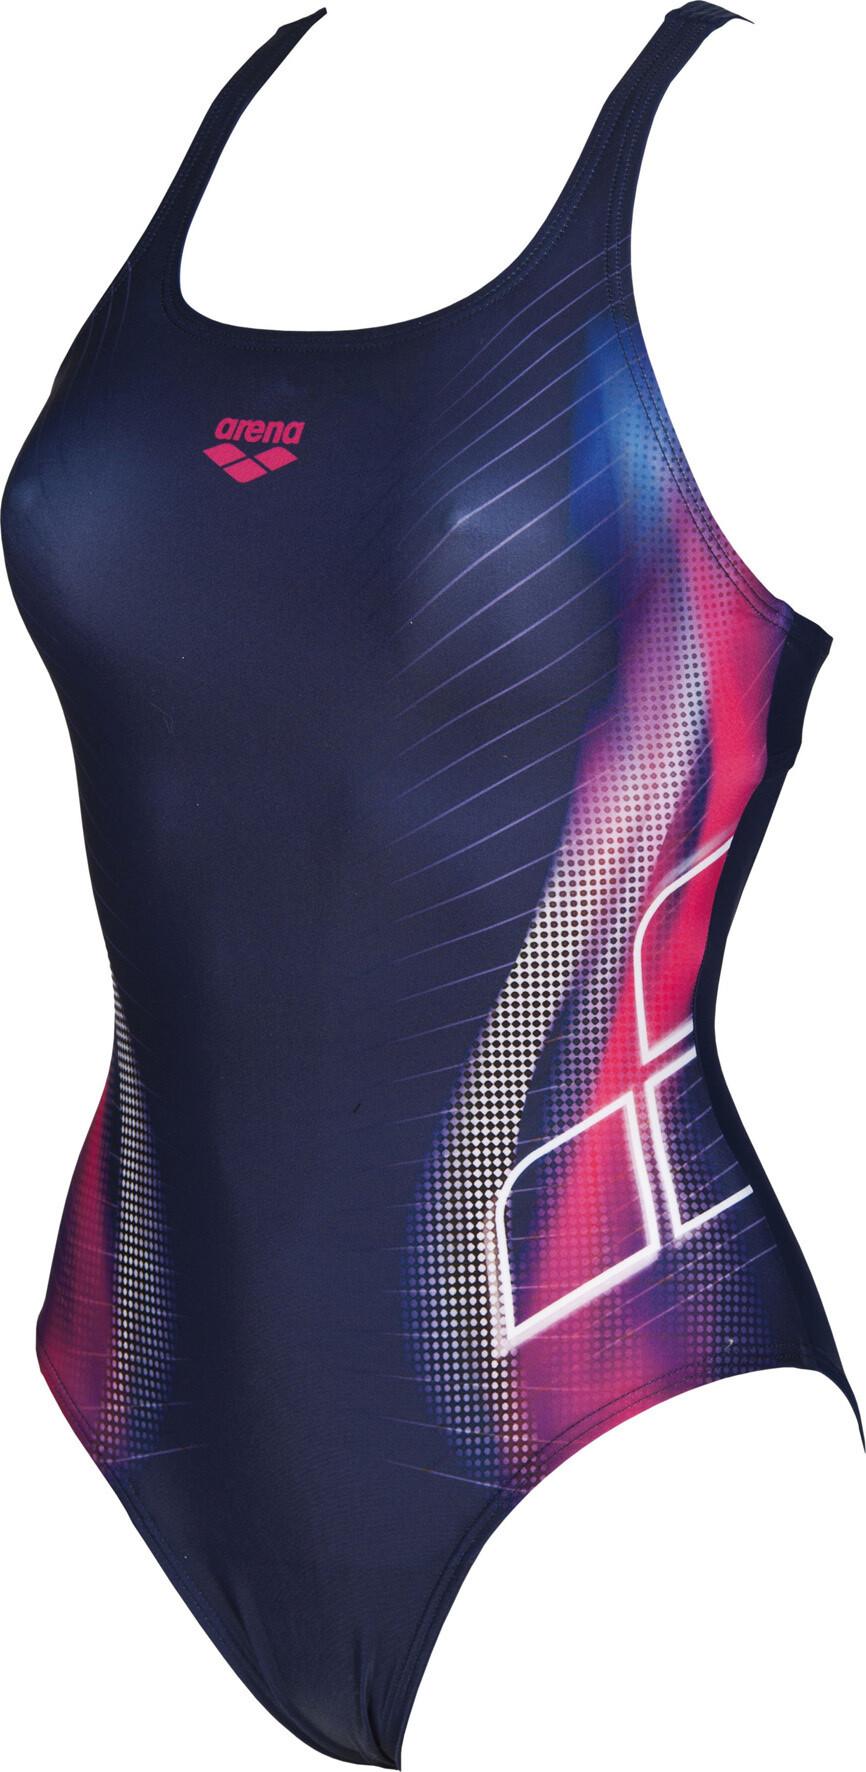 be5cc9030d4b19 arena Briza Swim Pro L One Piece Swimsuit Damen navy-shiny pink ...